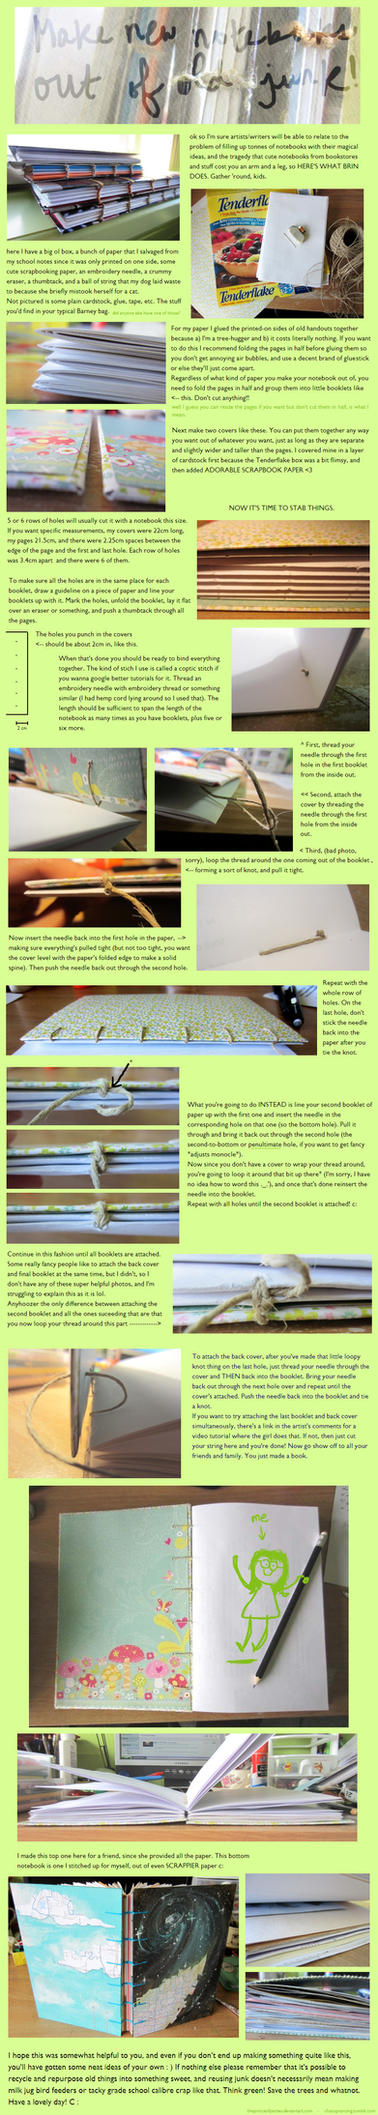 a handy notebook tutorial by ThePrinceOfParties